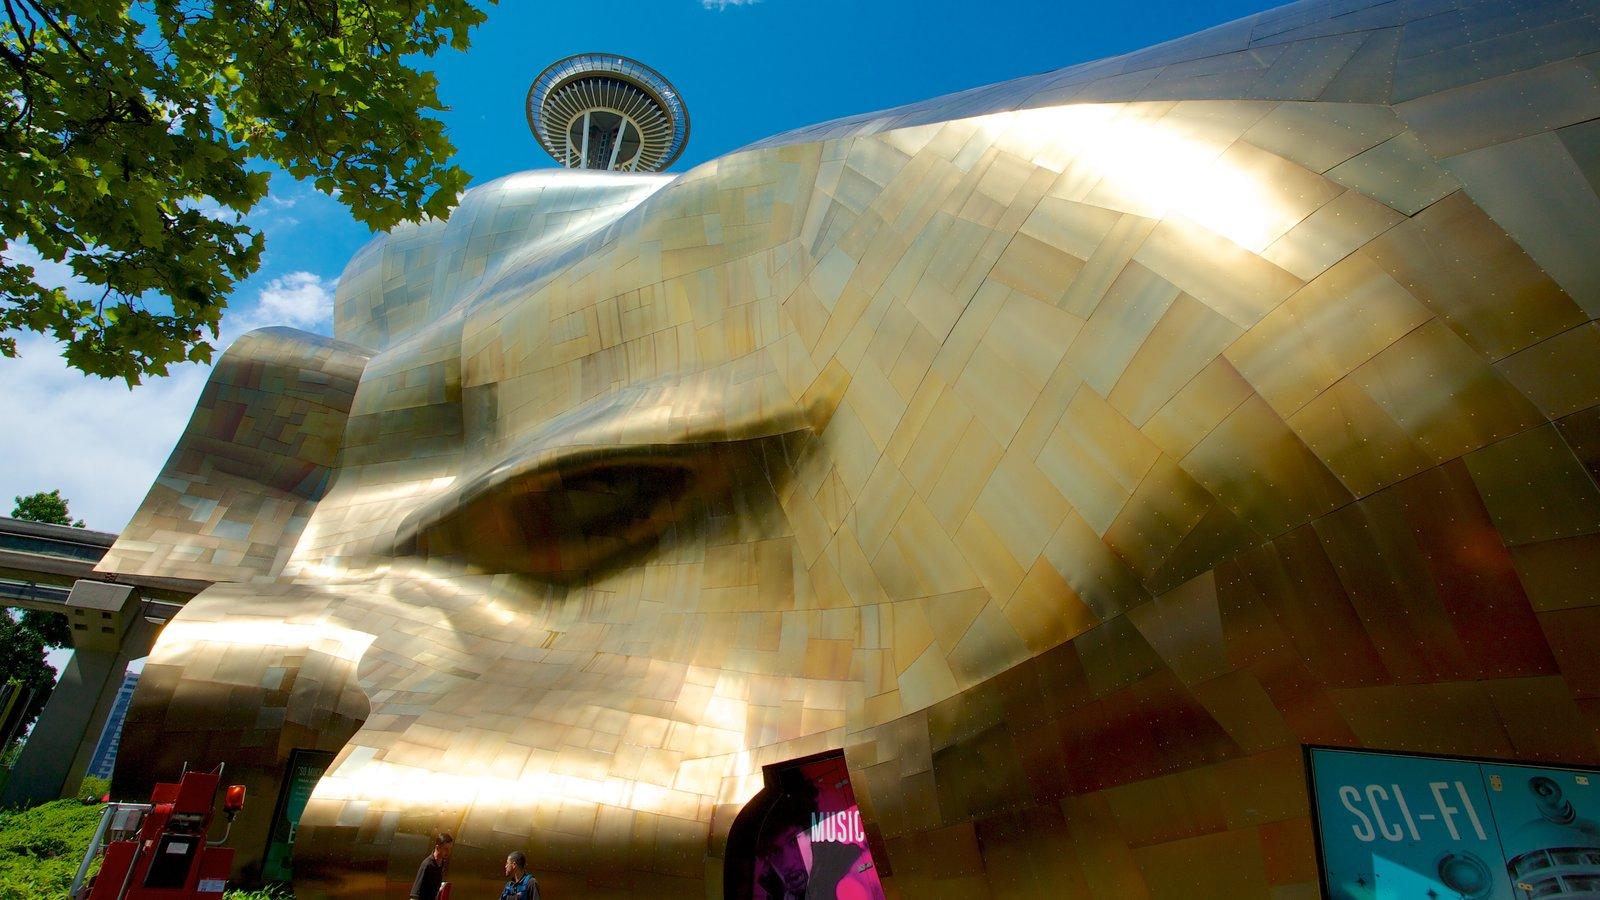 Seattle Center caracterizando arquitetura moderna